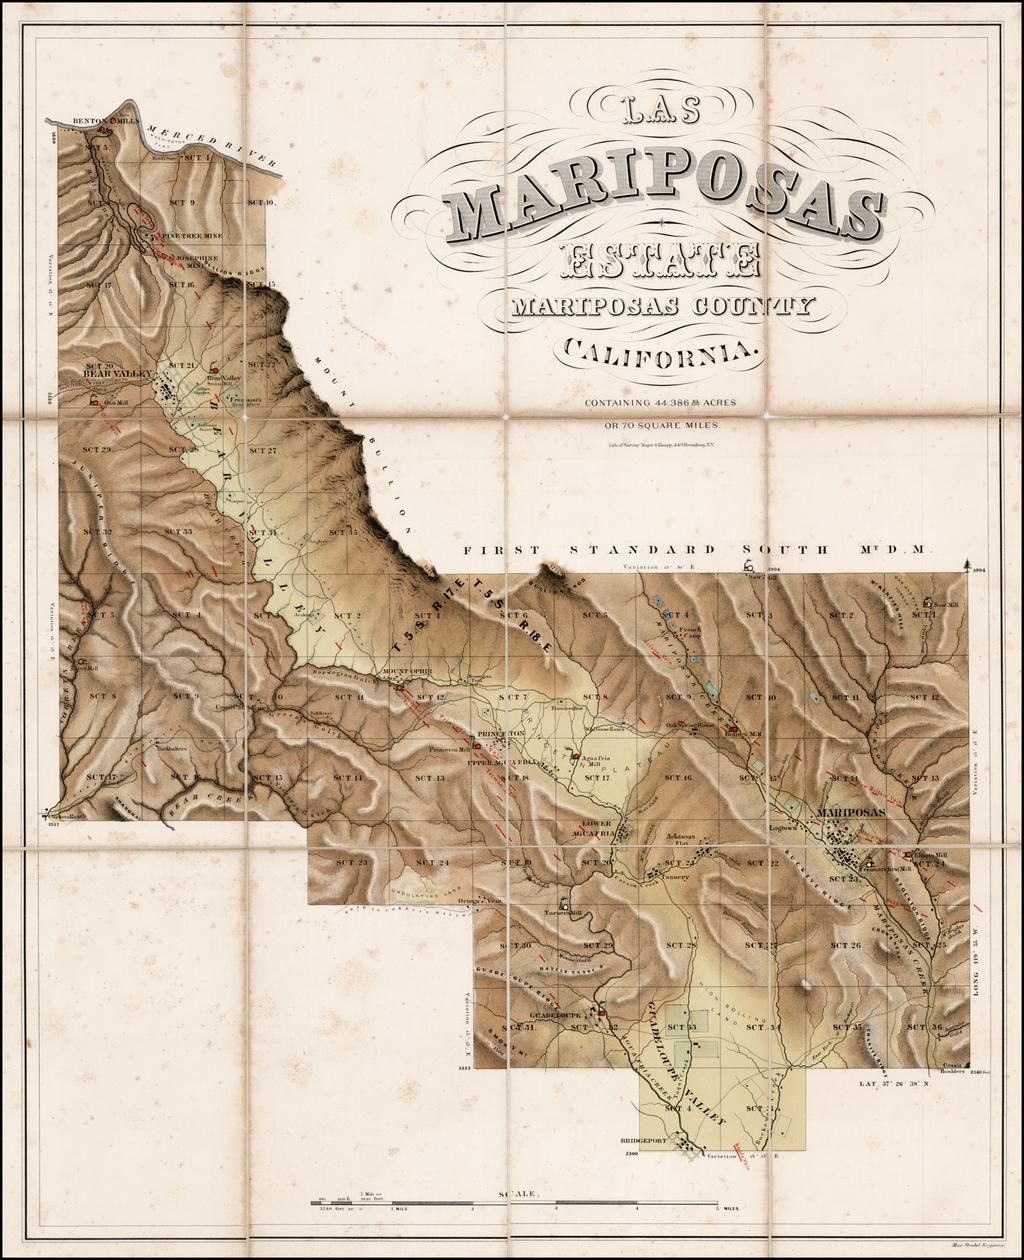 Las Mariposas Estate Mariposas County California . . . By Sarony, Major & Knapp / John Charles Fremont